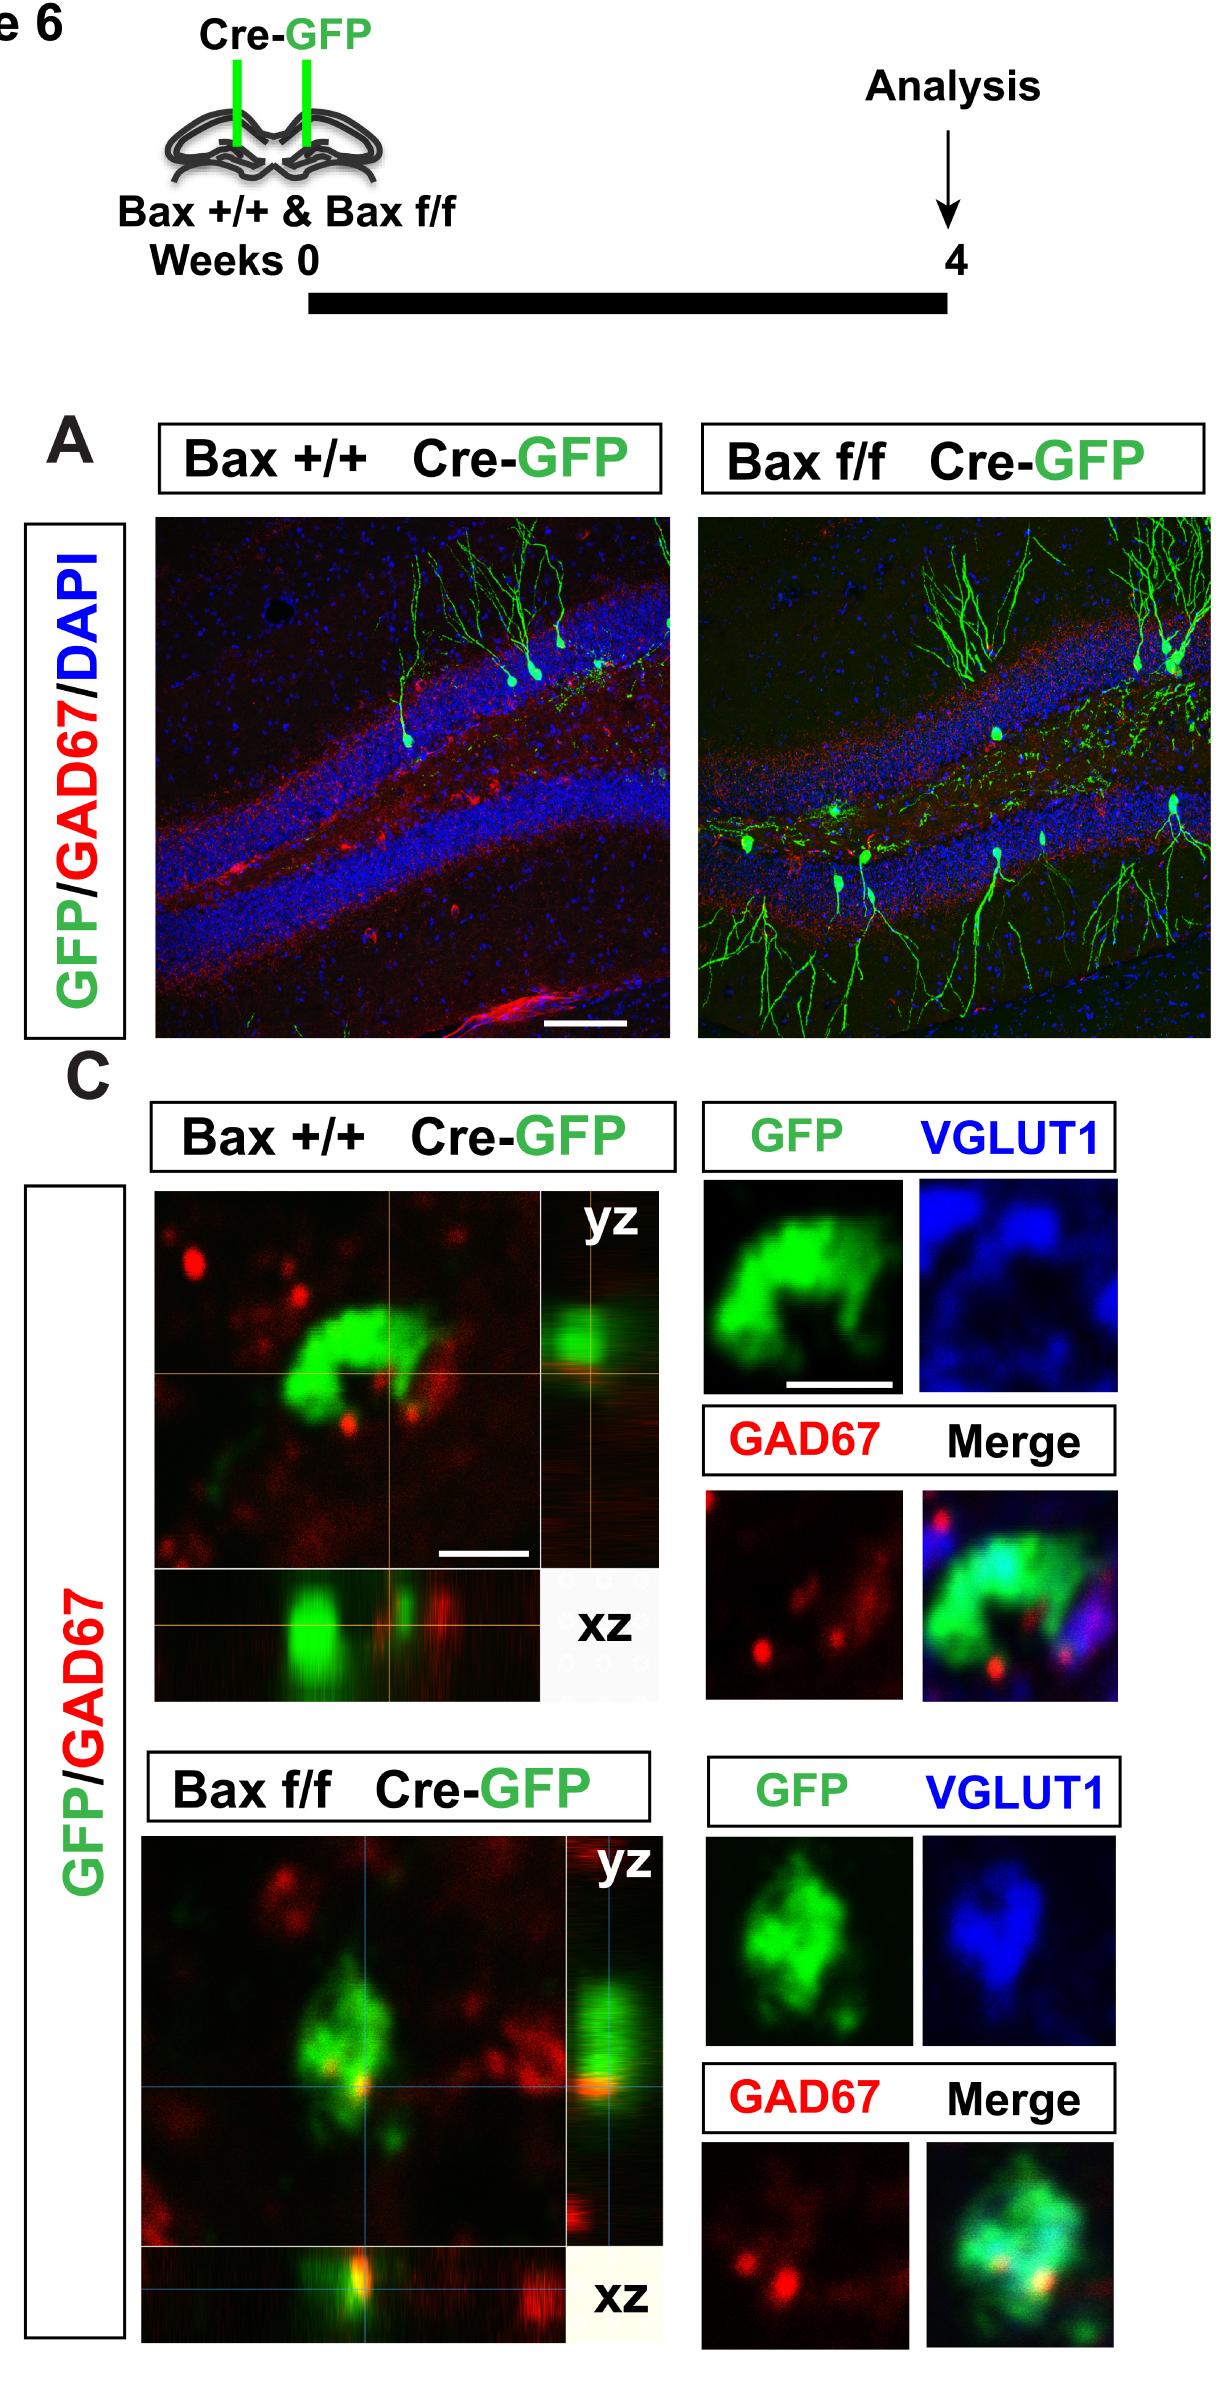 7-Prinsip Regenerasi Otak dan gambaran neuron secara histology